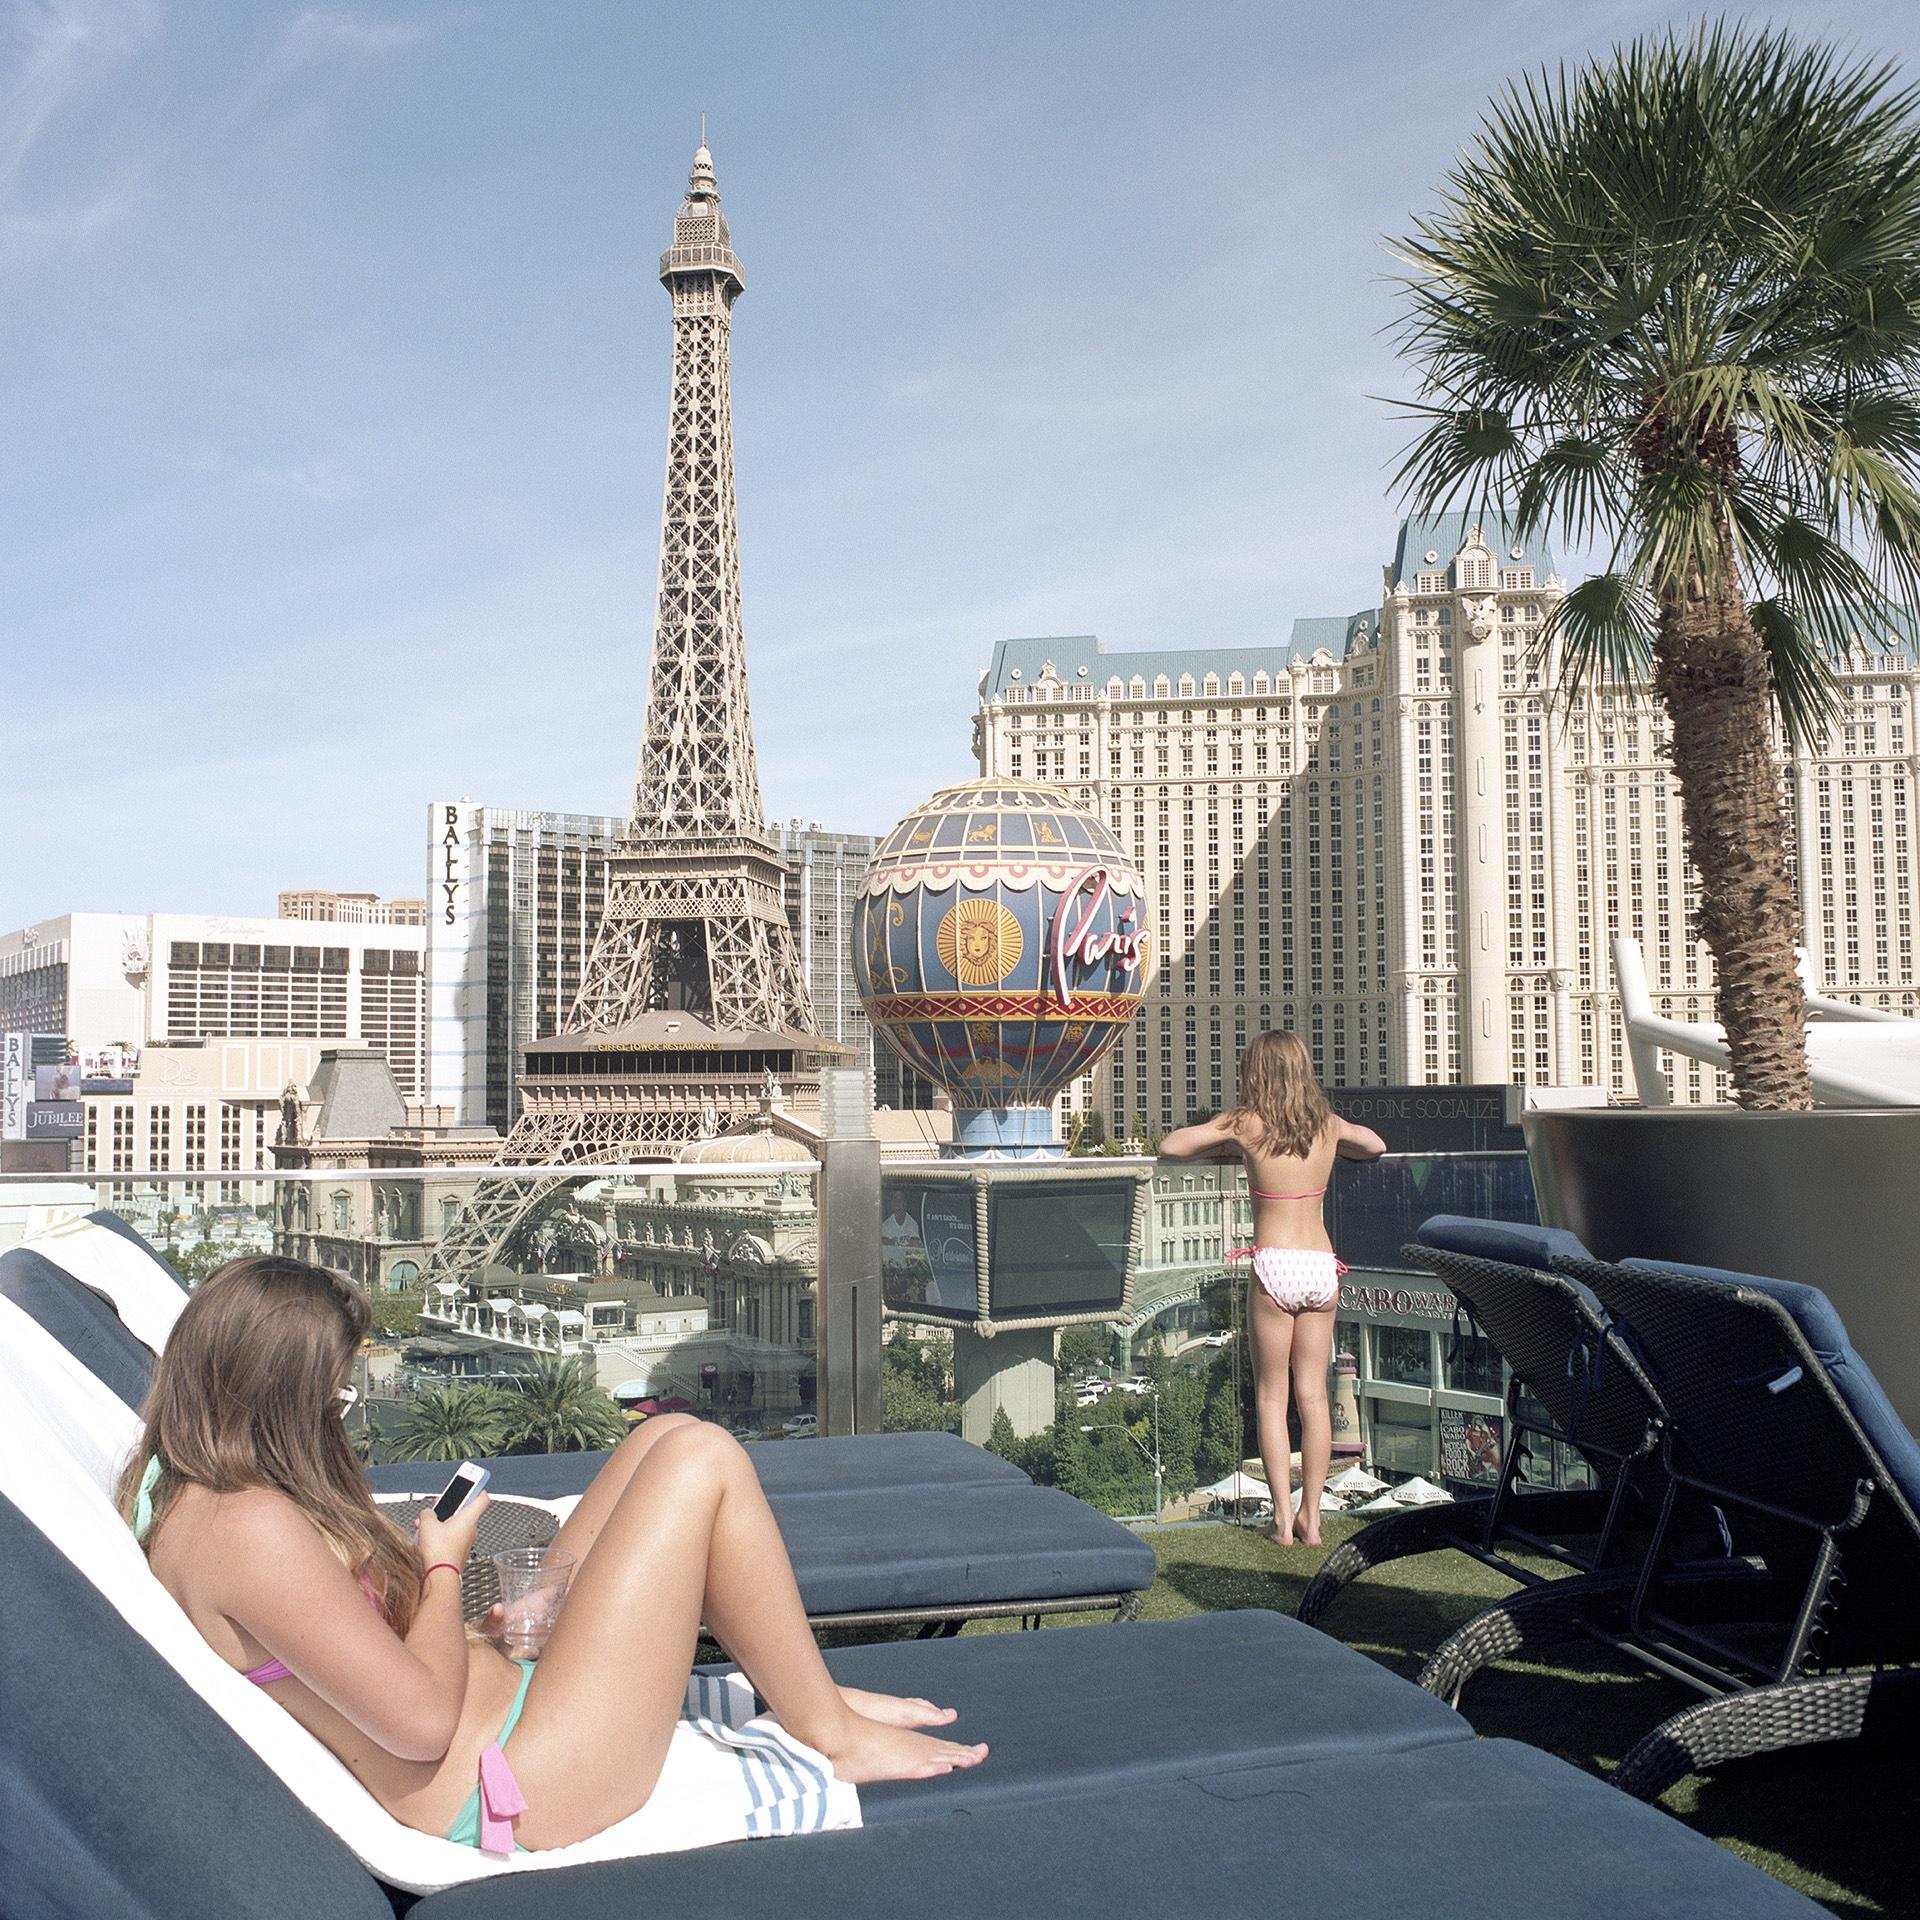 005_harris_Las Vegas 6B-68B